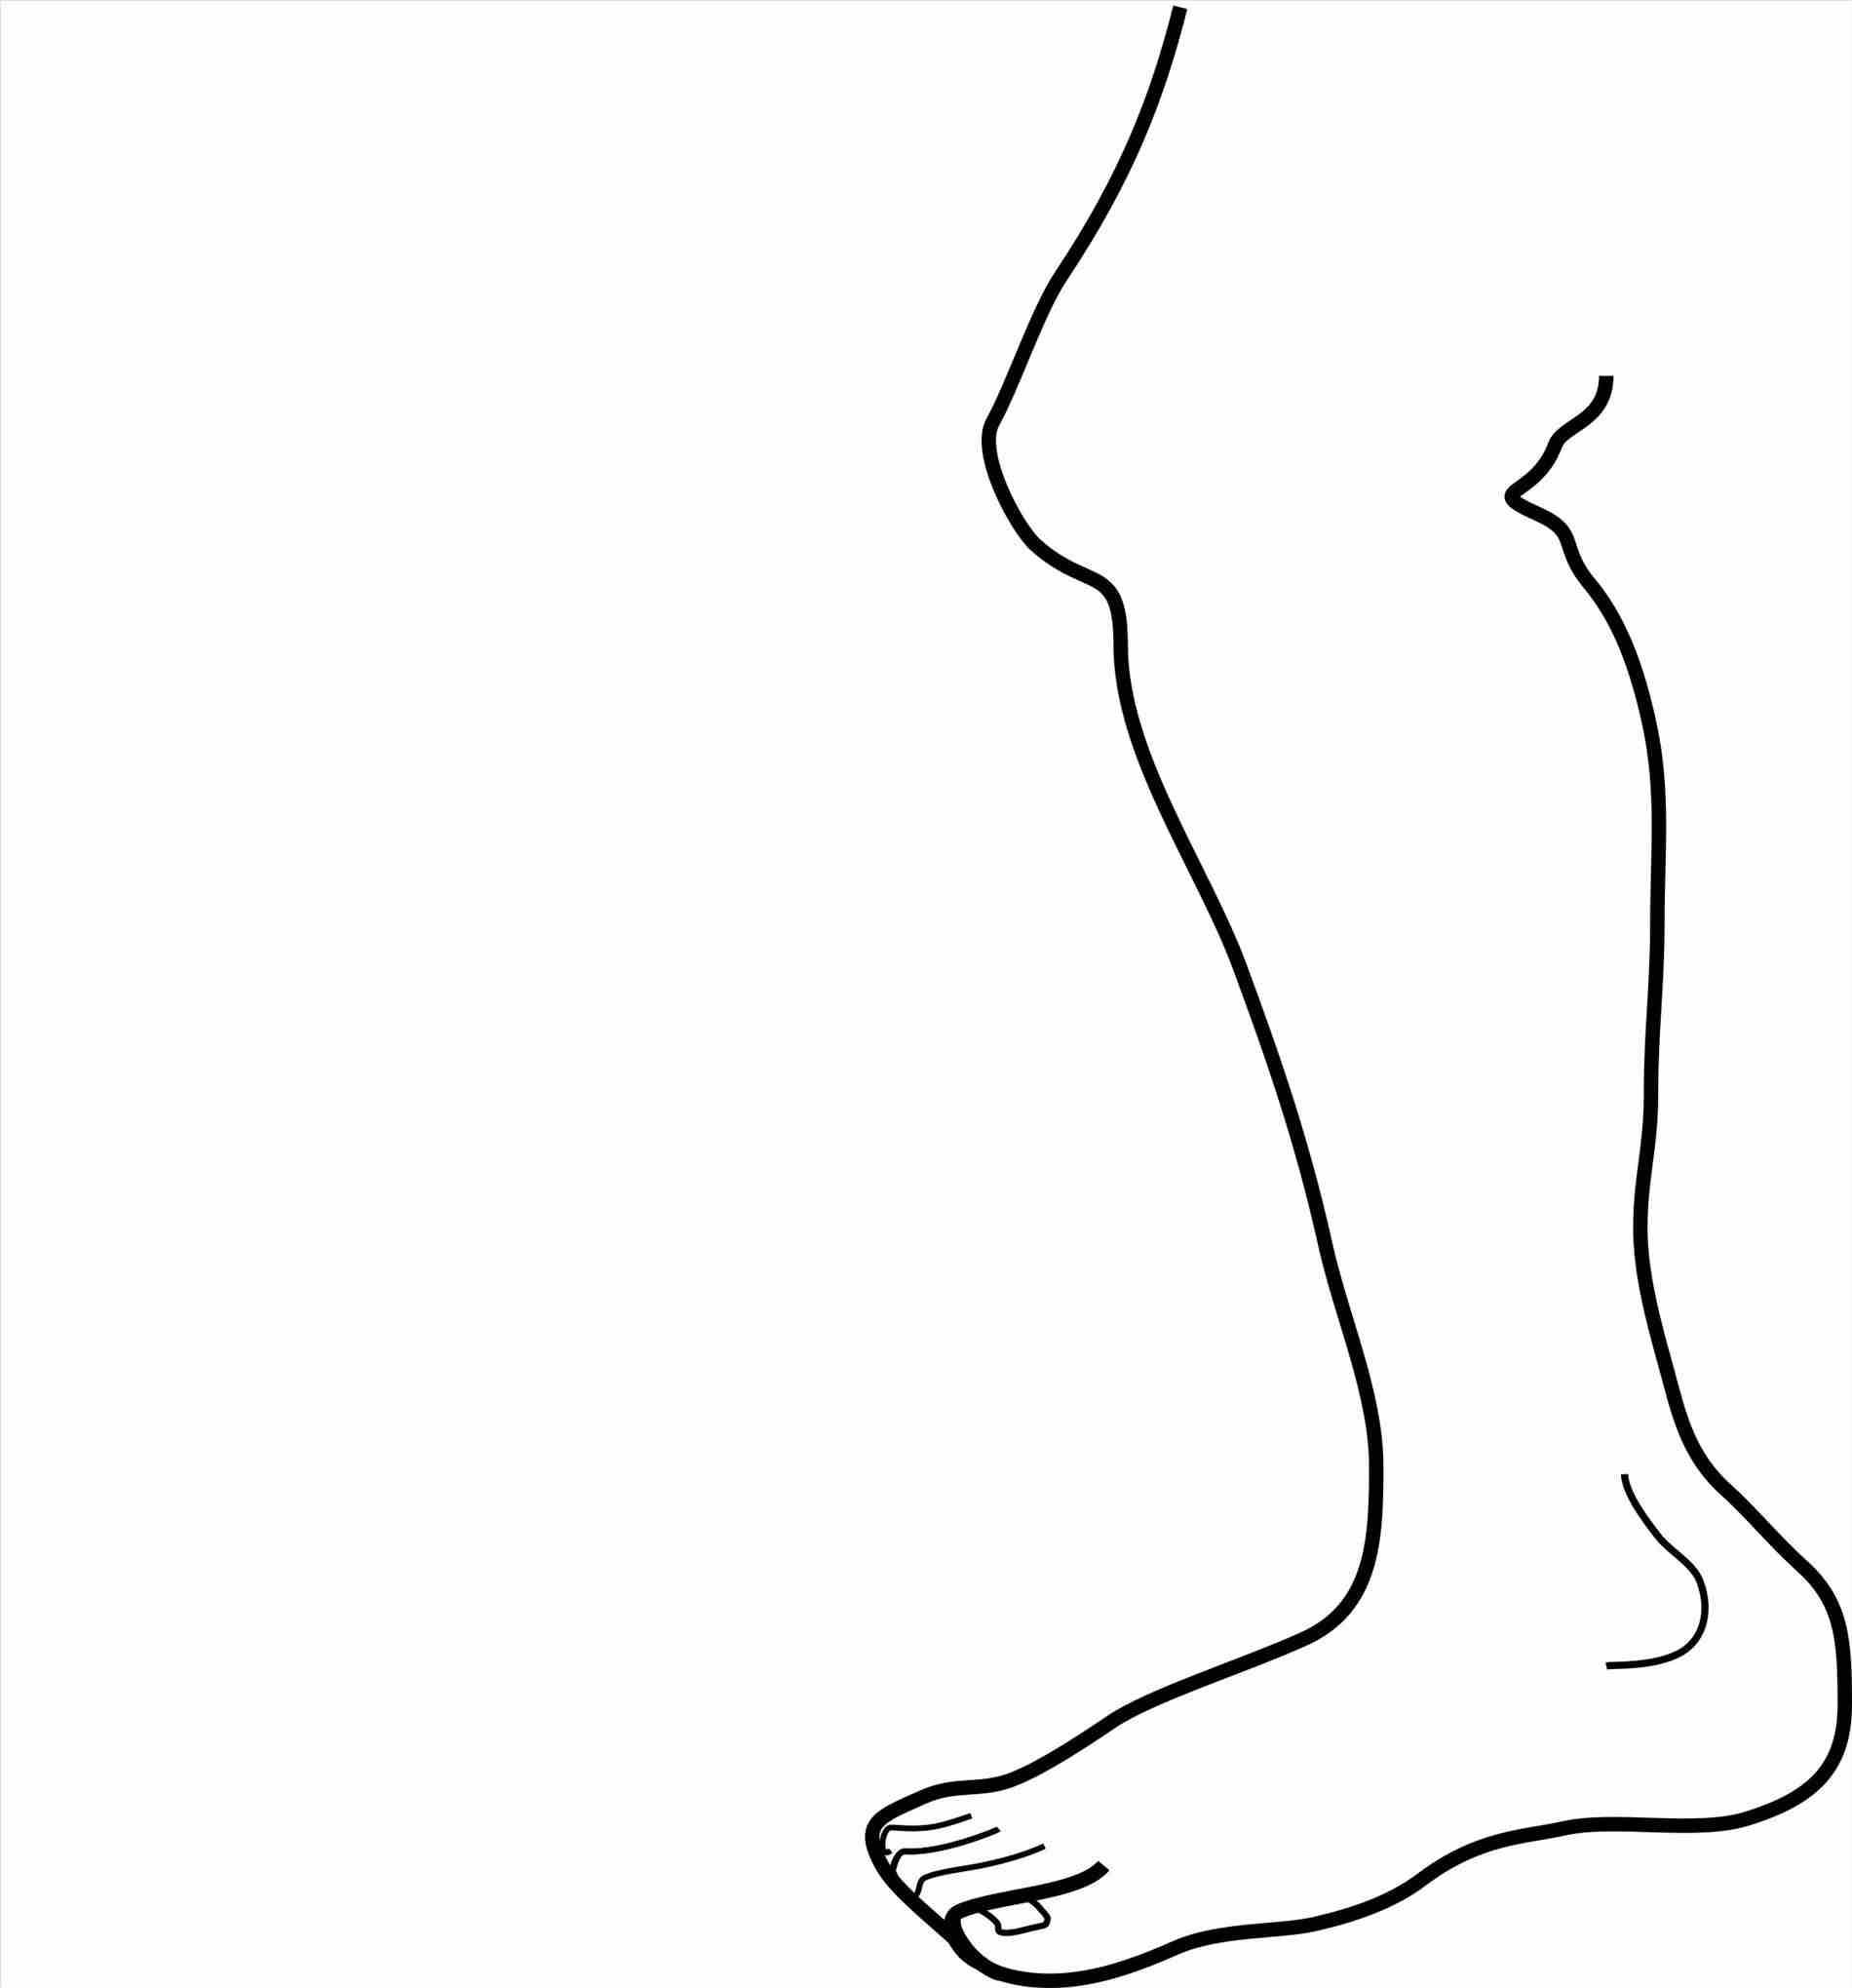 Leg clipart. Turkey black and white